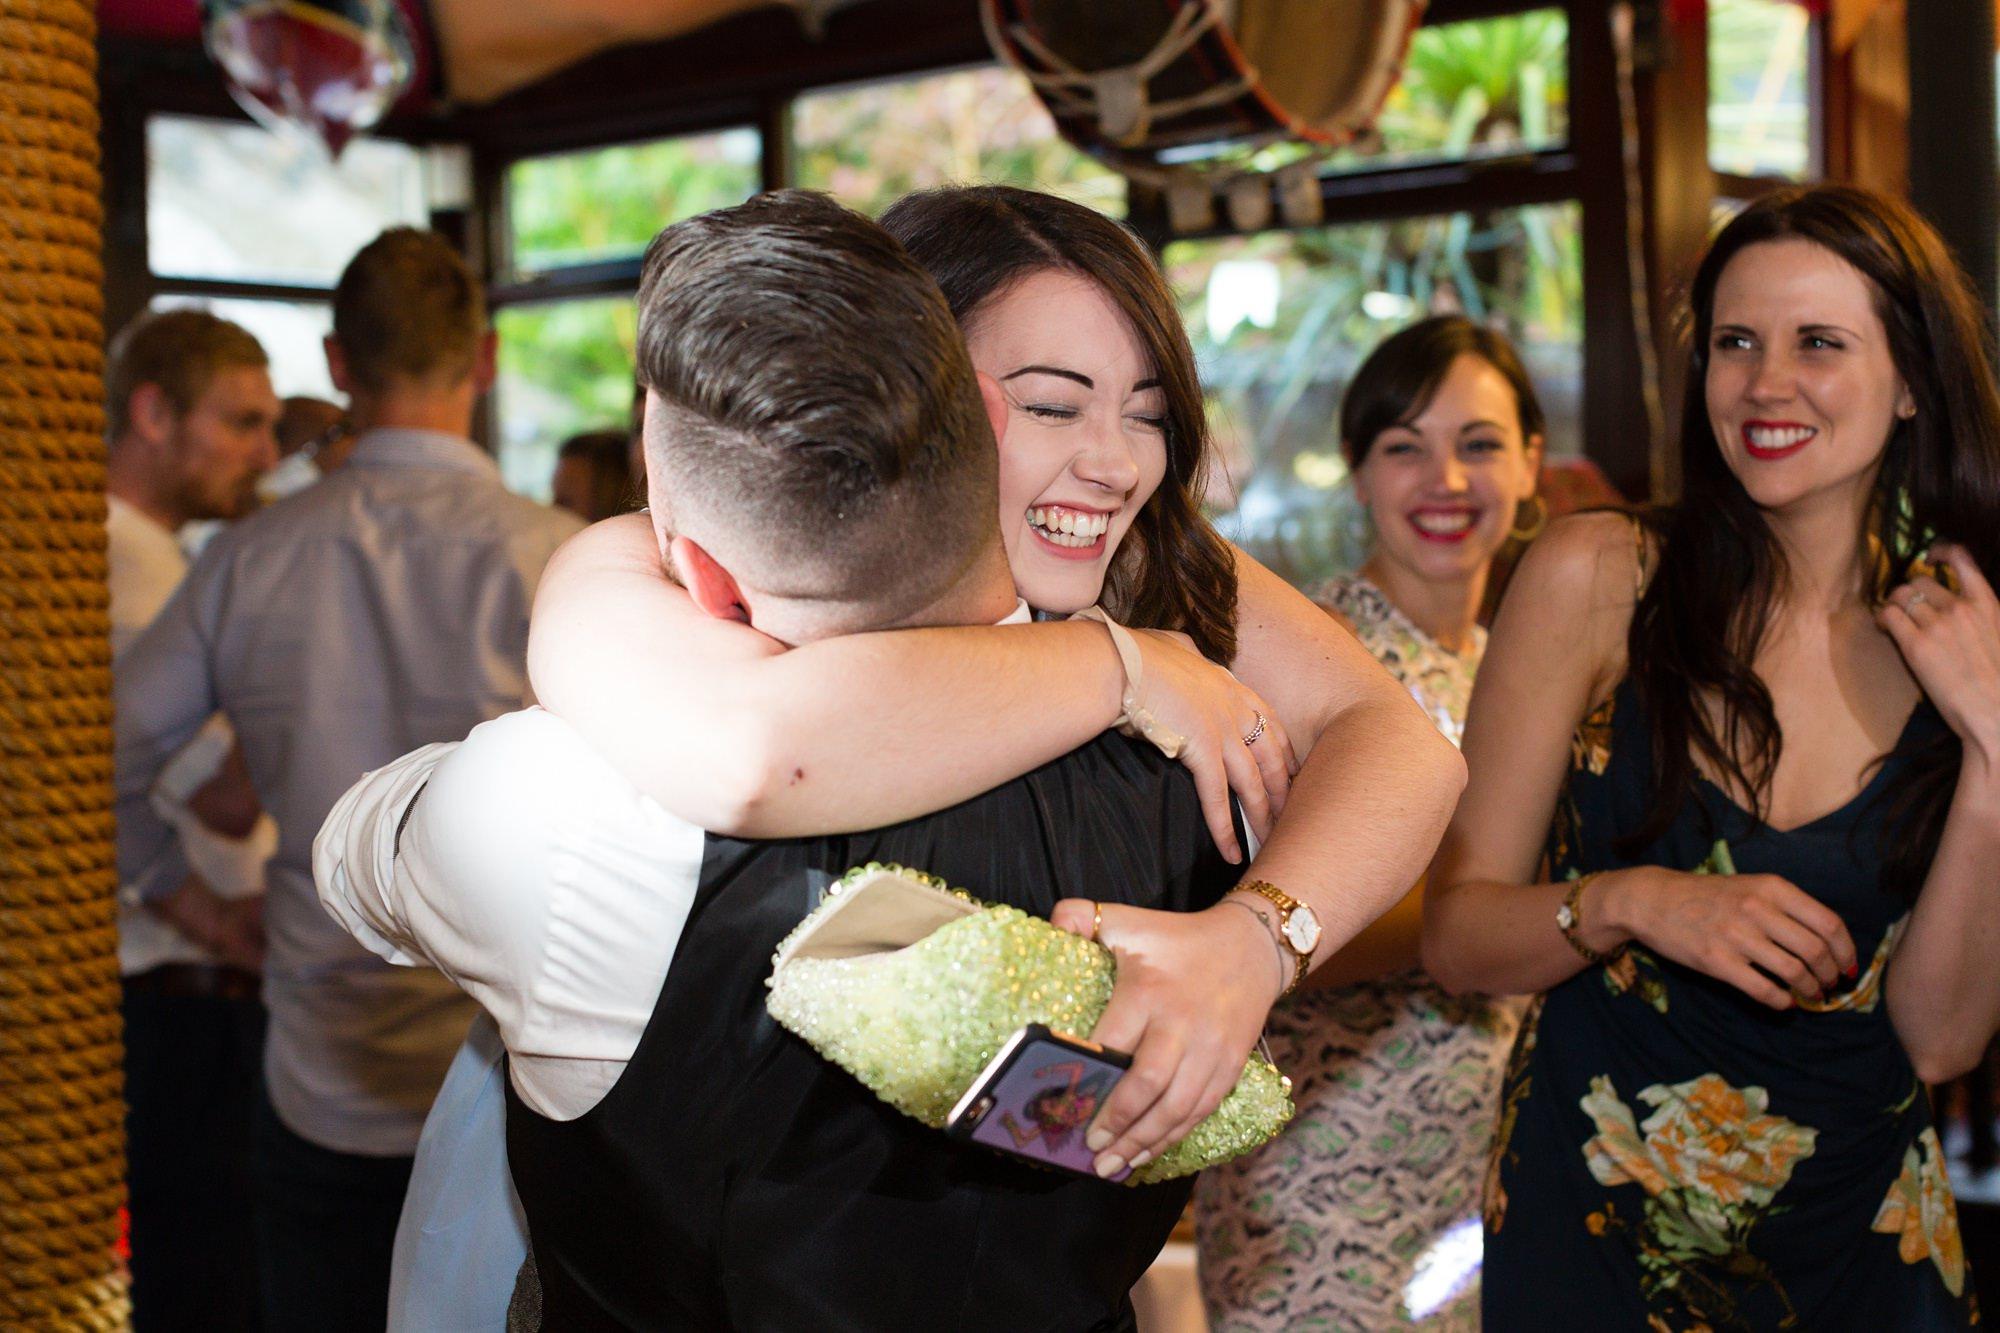 Guest hugging groom at Crab & Lobster wedding